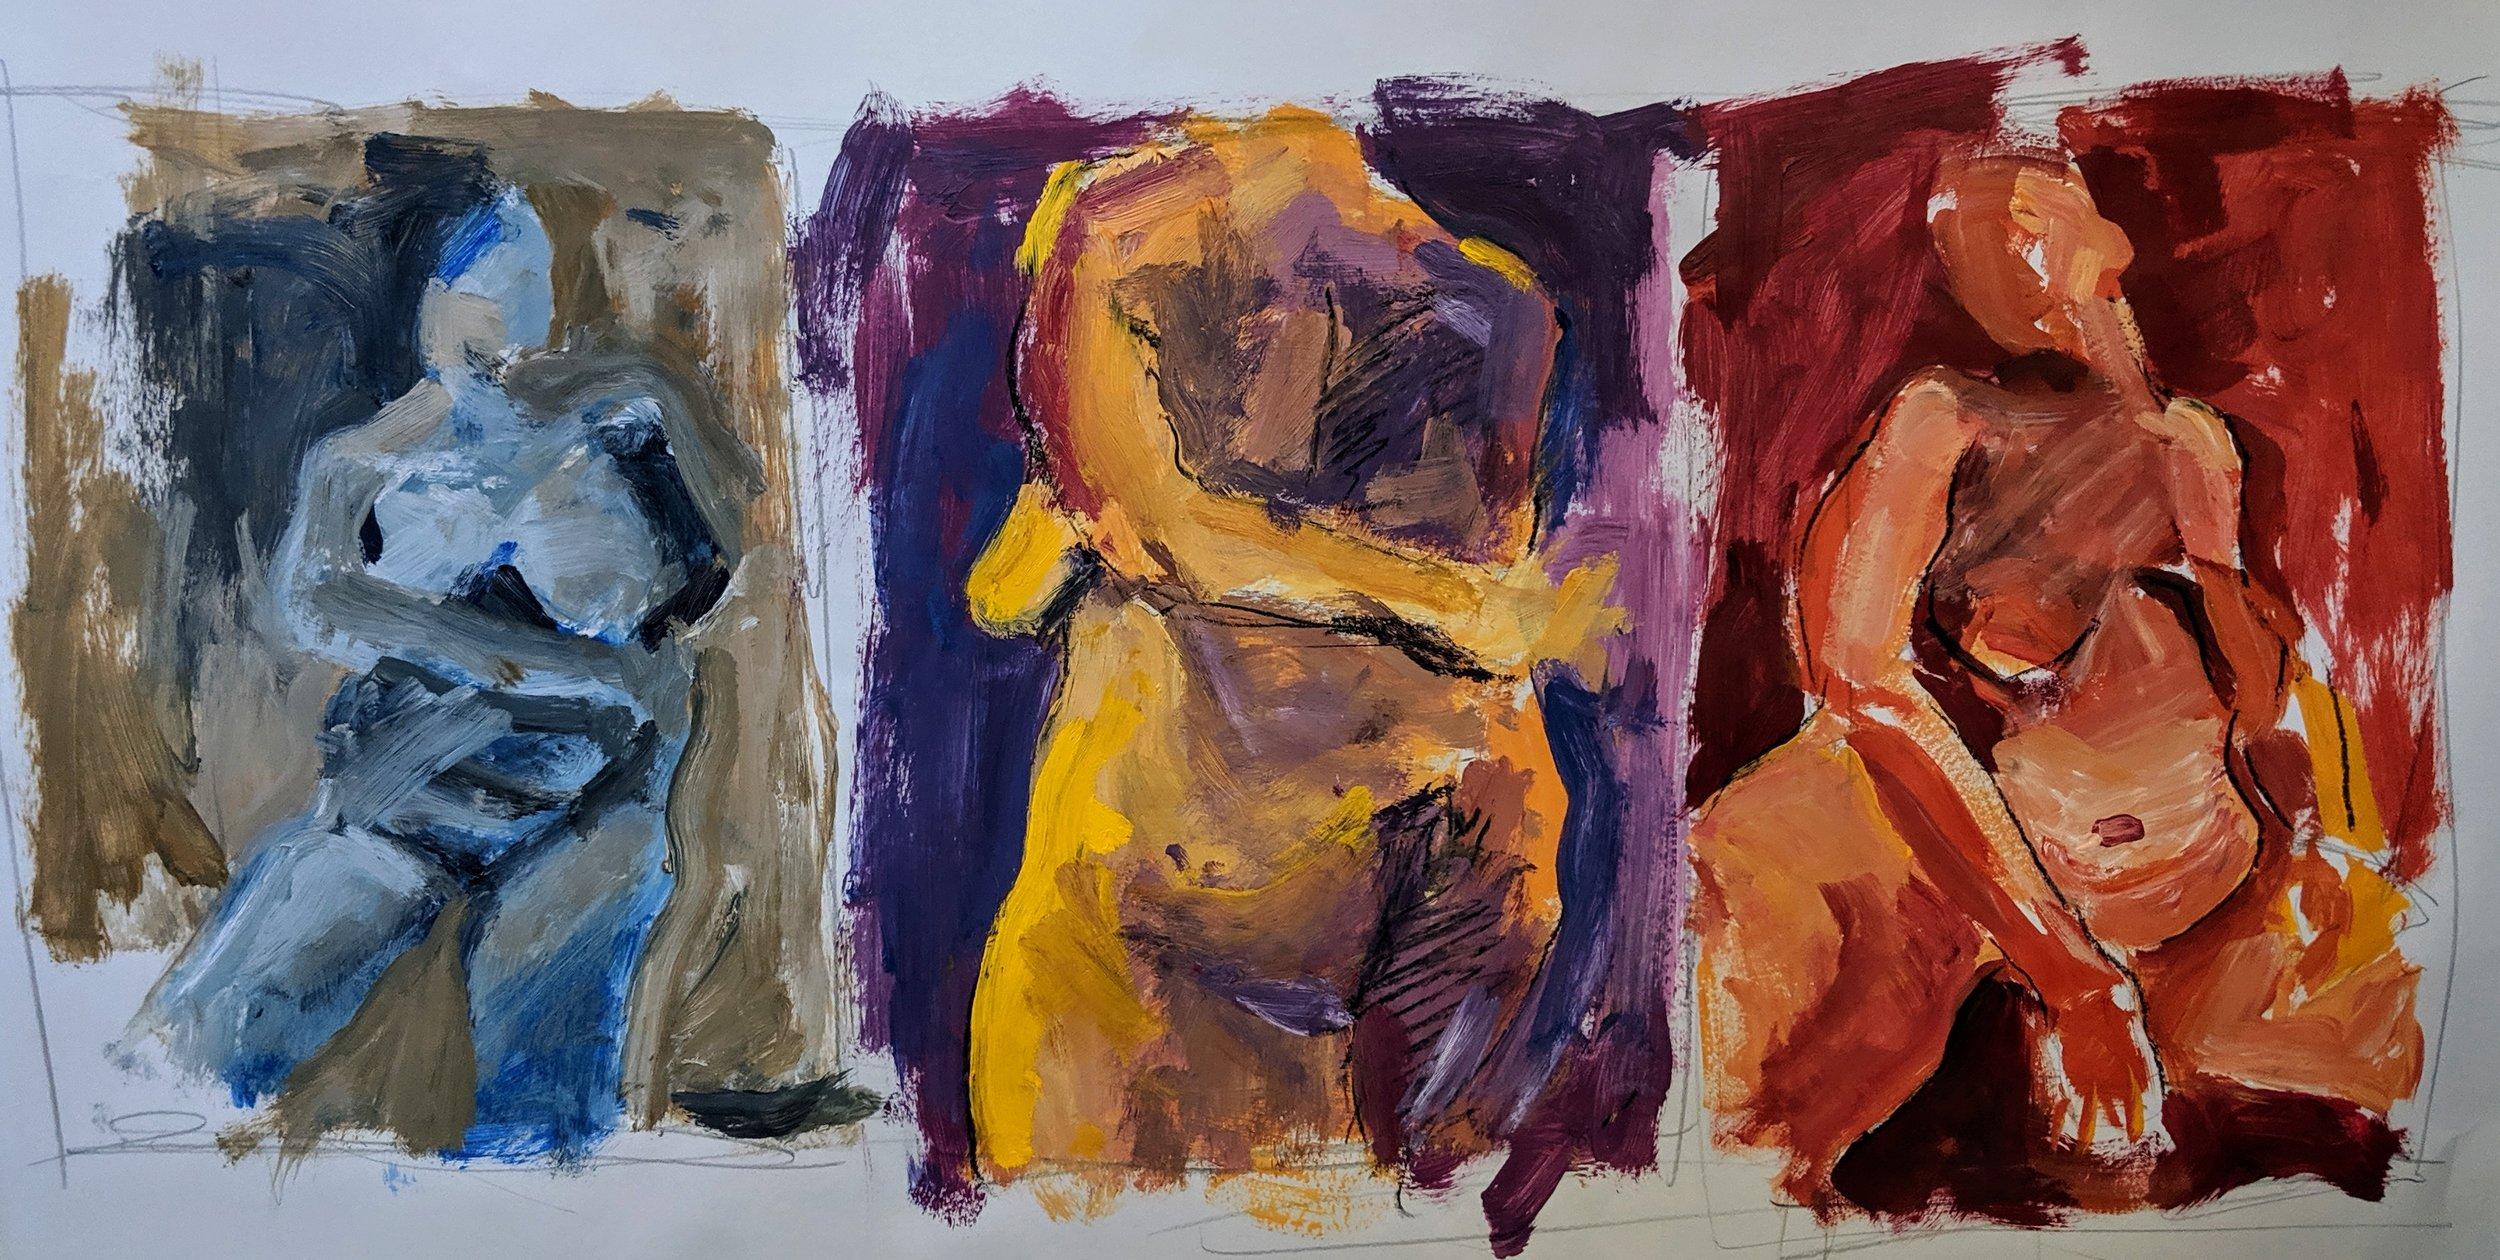 ©2019 Marie Ramey | Figure Painting & Drawing Workshop, San Luis Obispo County (Arroyo Grande, CA) | David Limrite, Instructor